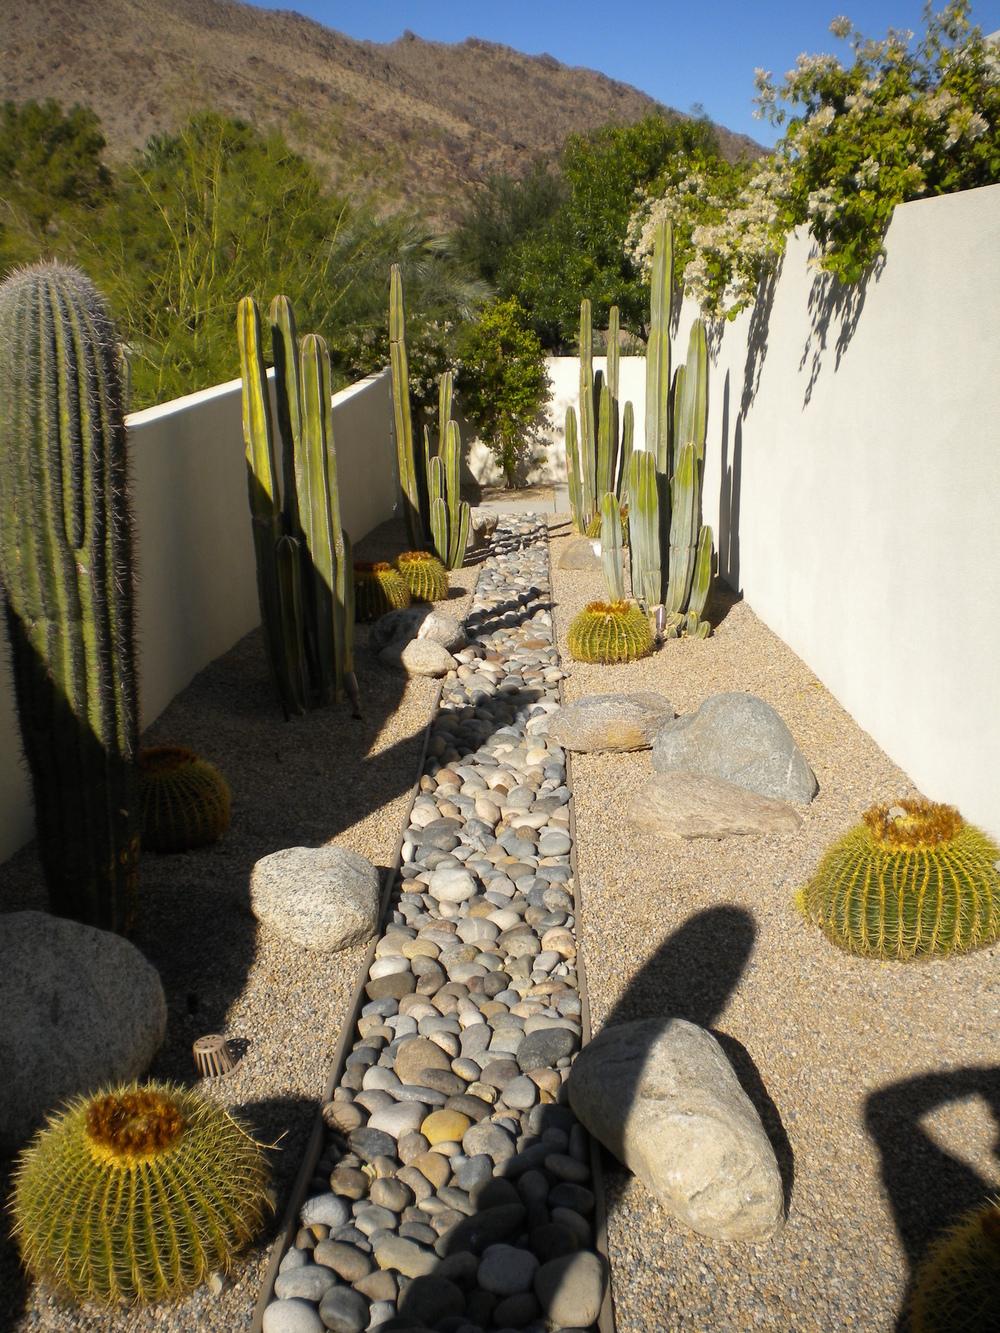 La+Mirada+Desert+Landscape.JPG